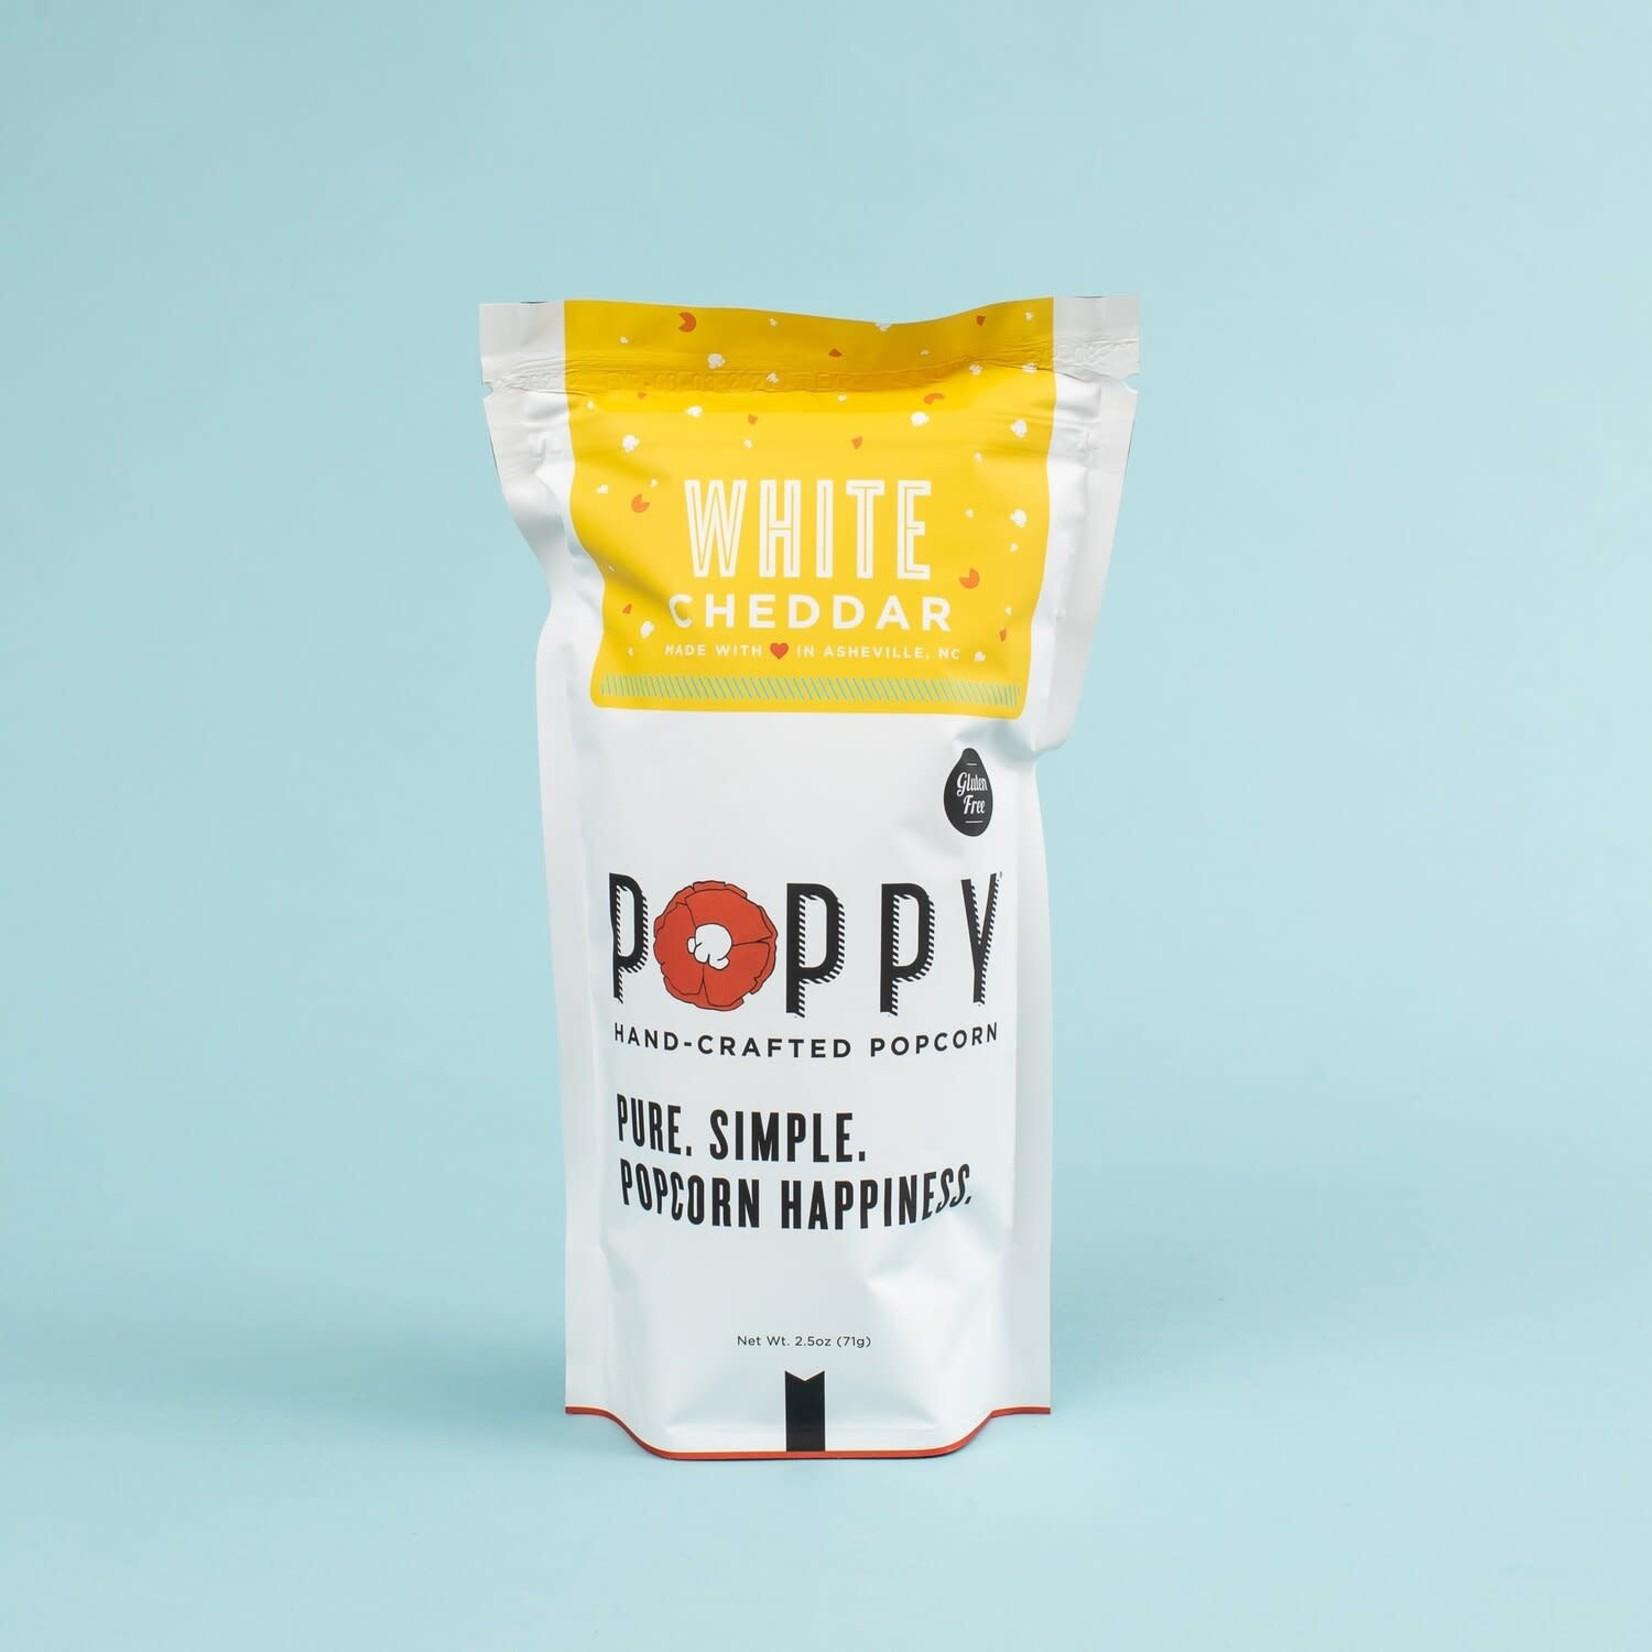 Poppy Handcrafted Popcorn Popcorn